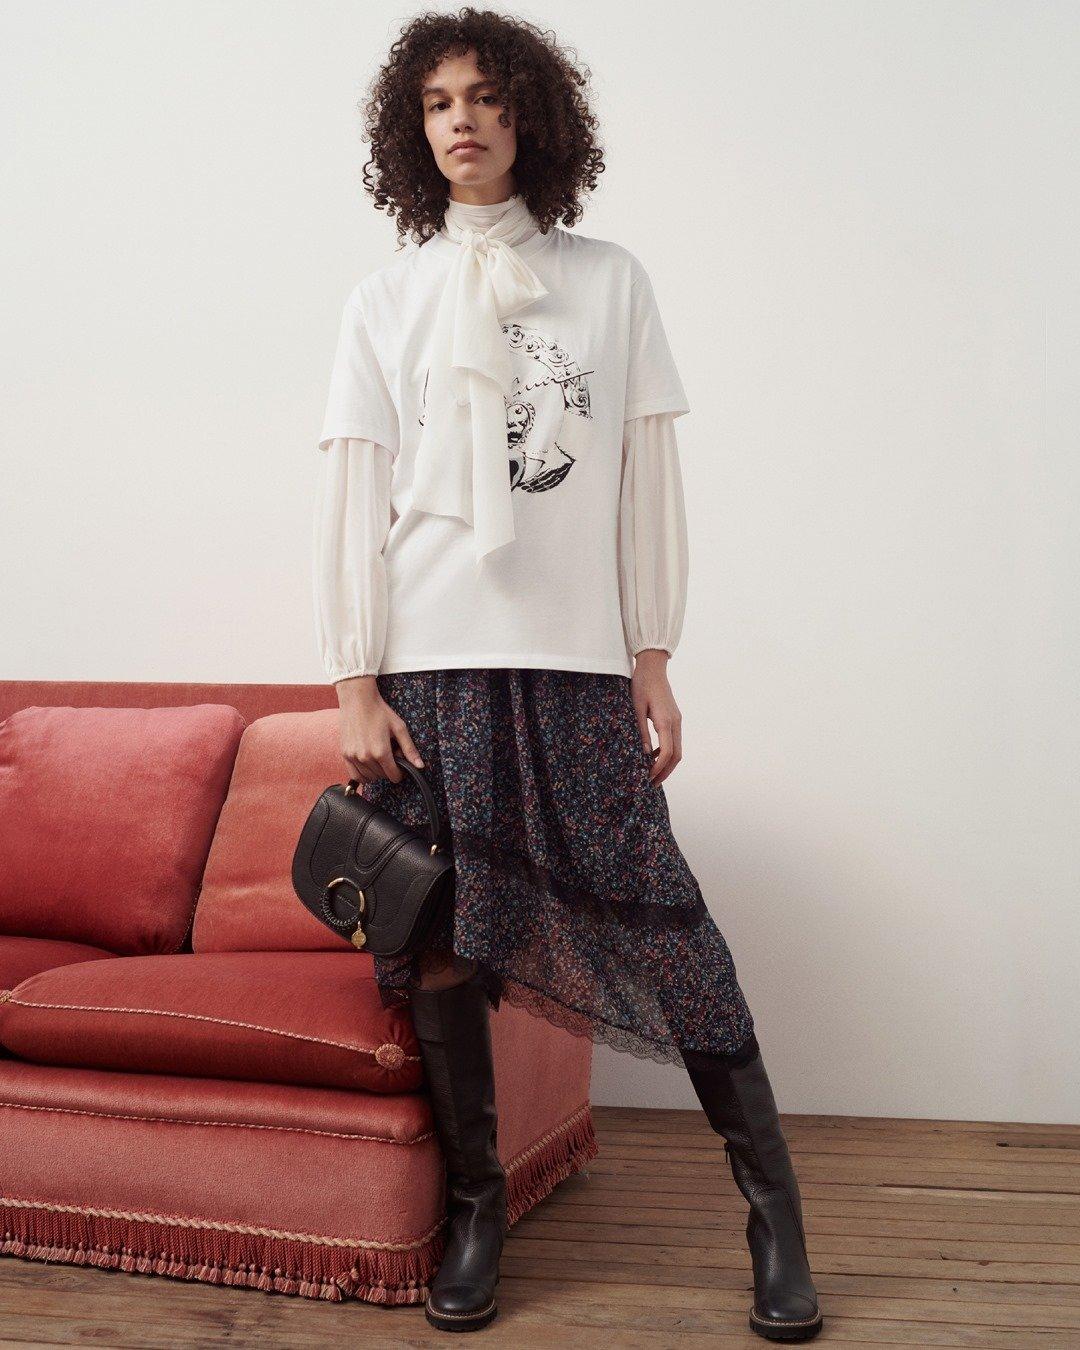 Model wearing See By Chloe Hana Bag